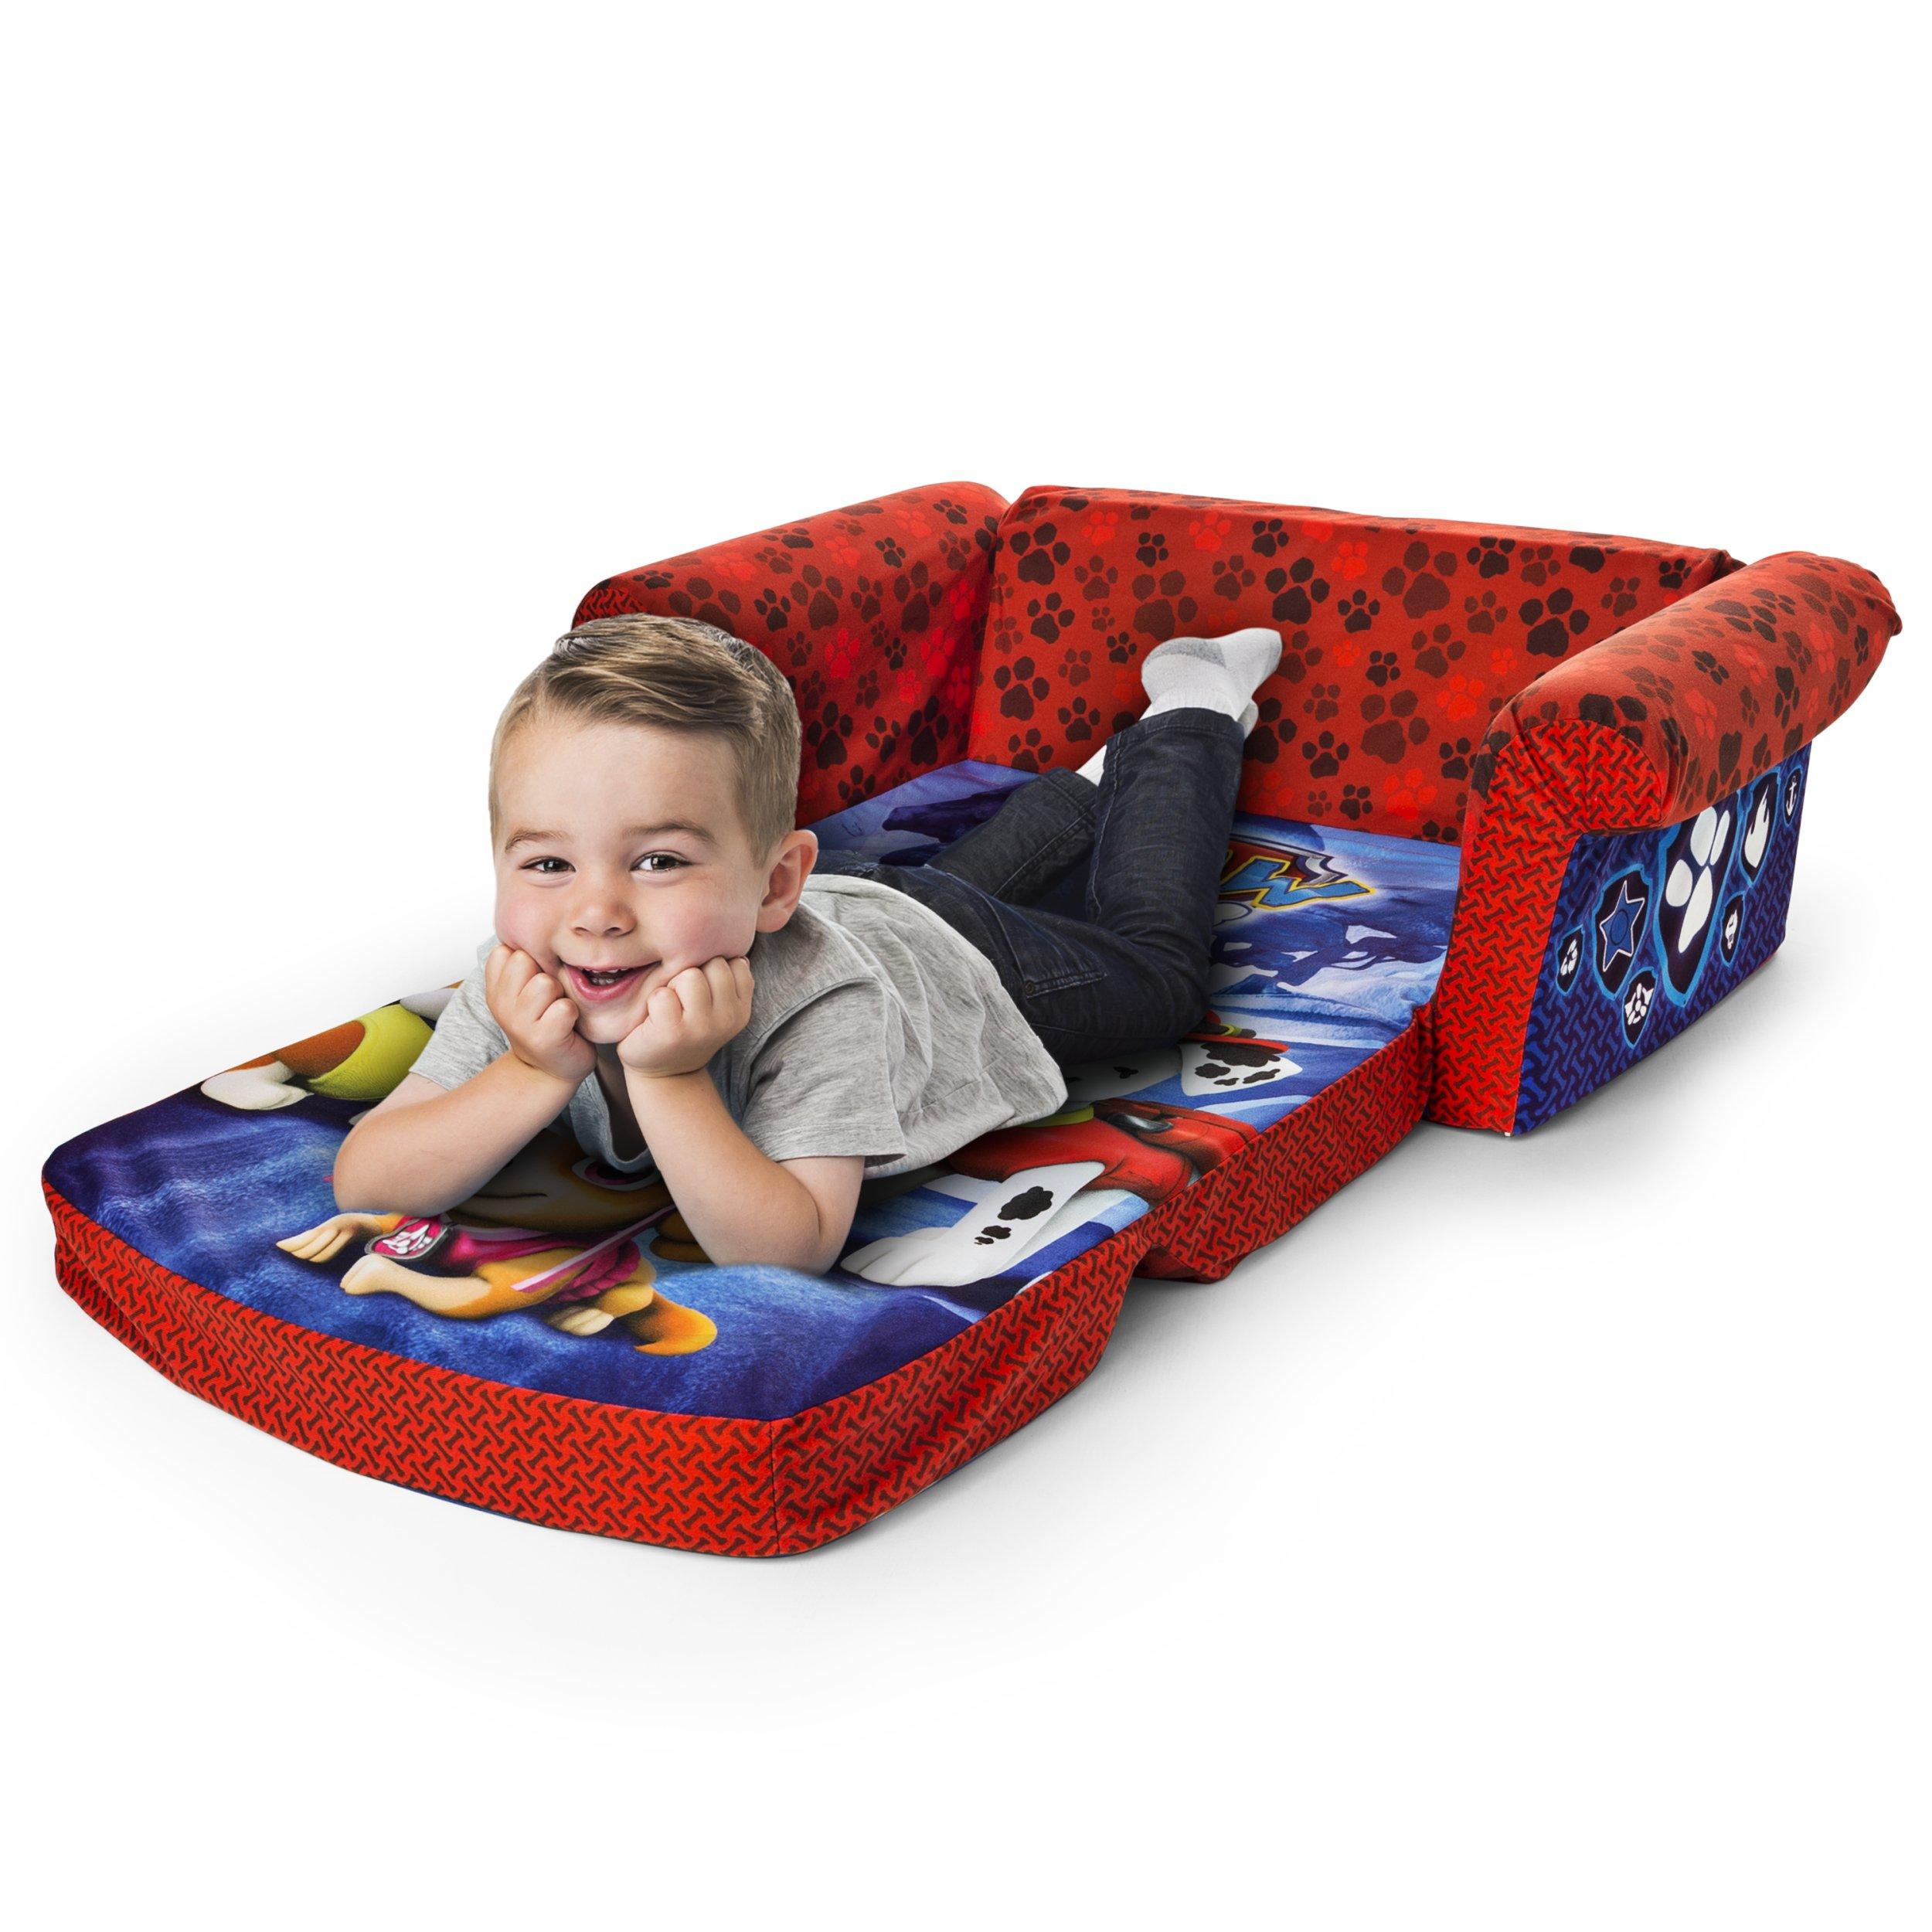 Marshmallow Furniture Children's 2 in 1 Flip Open Foam, Nickelodeon Paw Patrol Sofa Chair Furniture, Red by Marshmallow Furniture (Image #2)